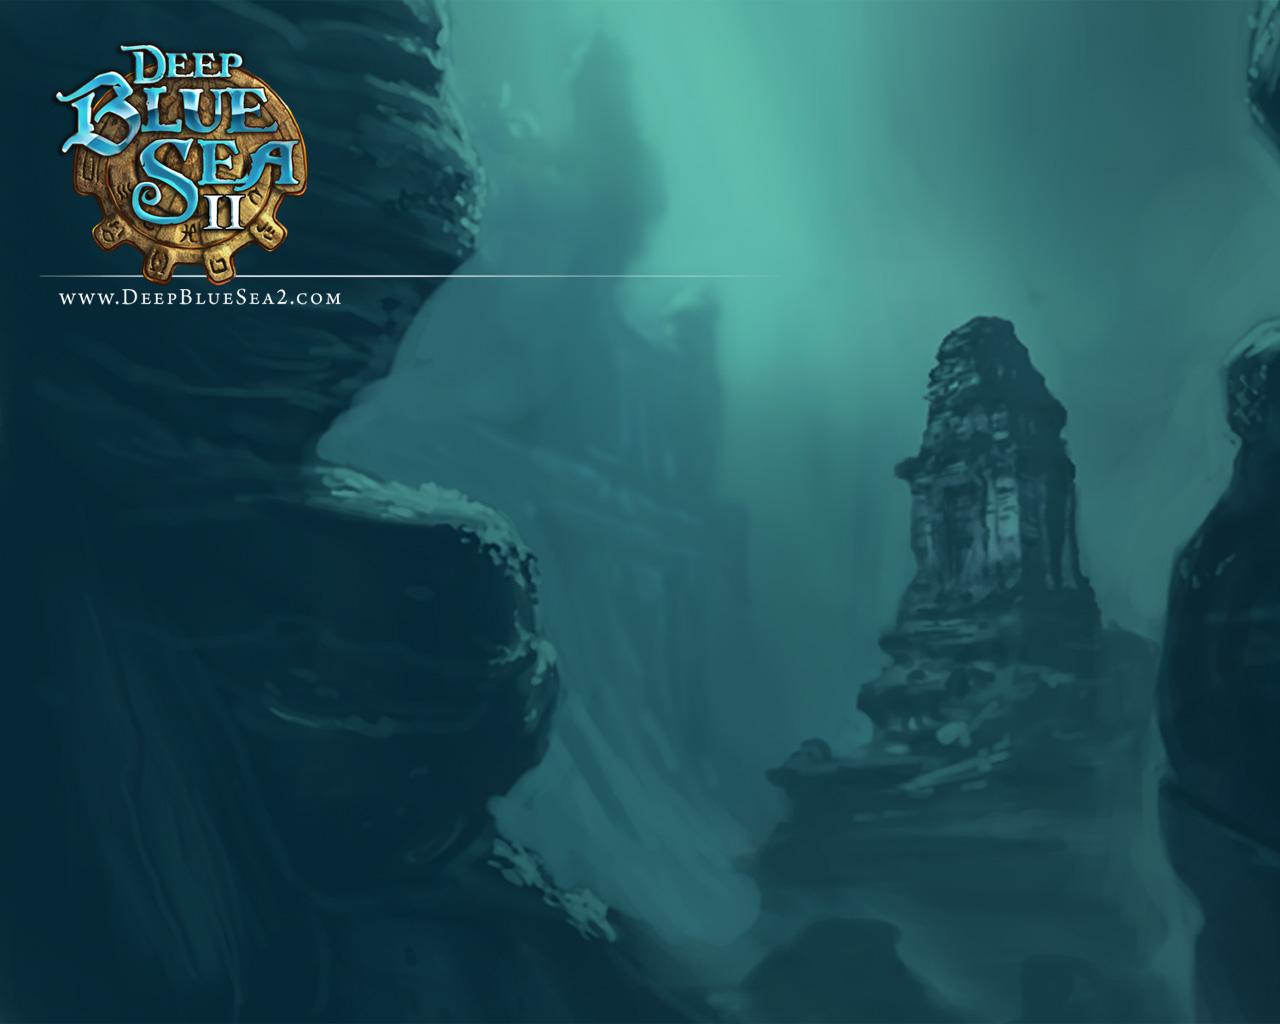 Deep Blue Sea 2 Desktop Backgrounds Wallpapers 1280x1024